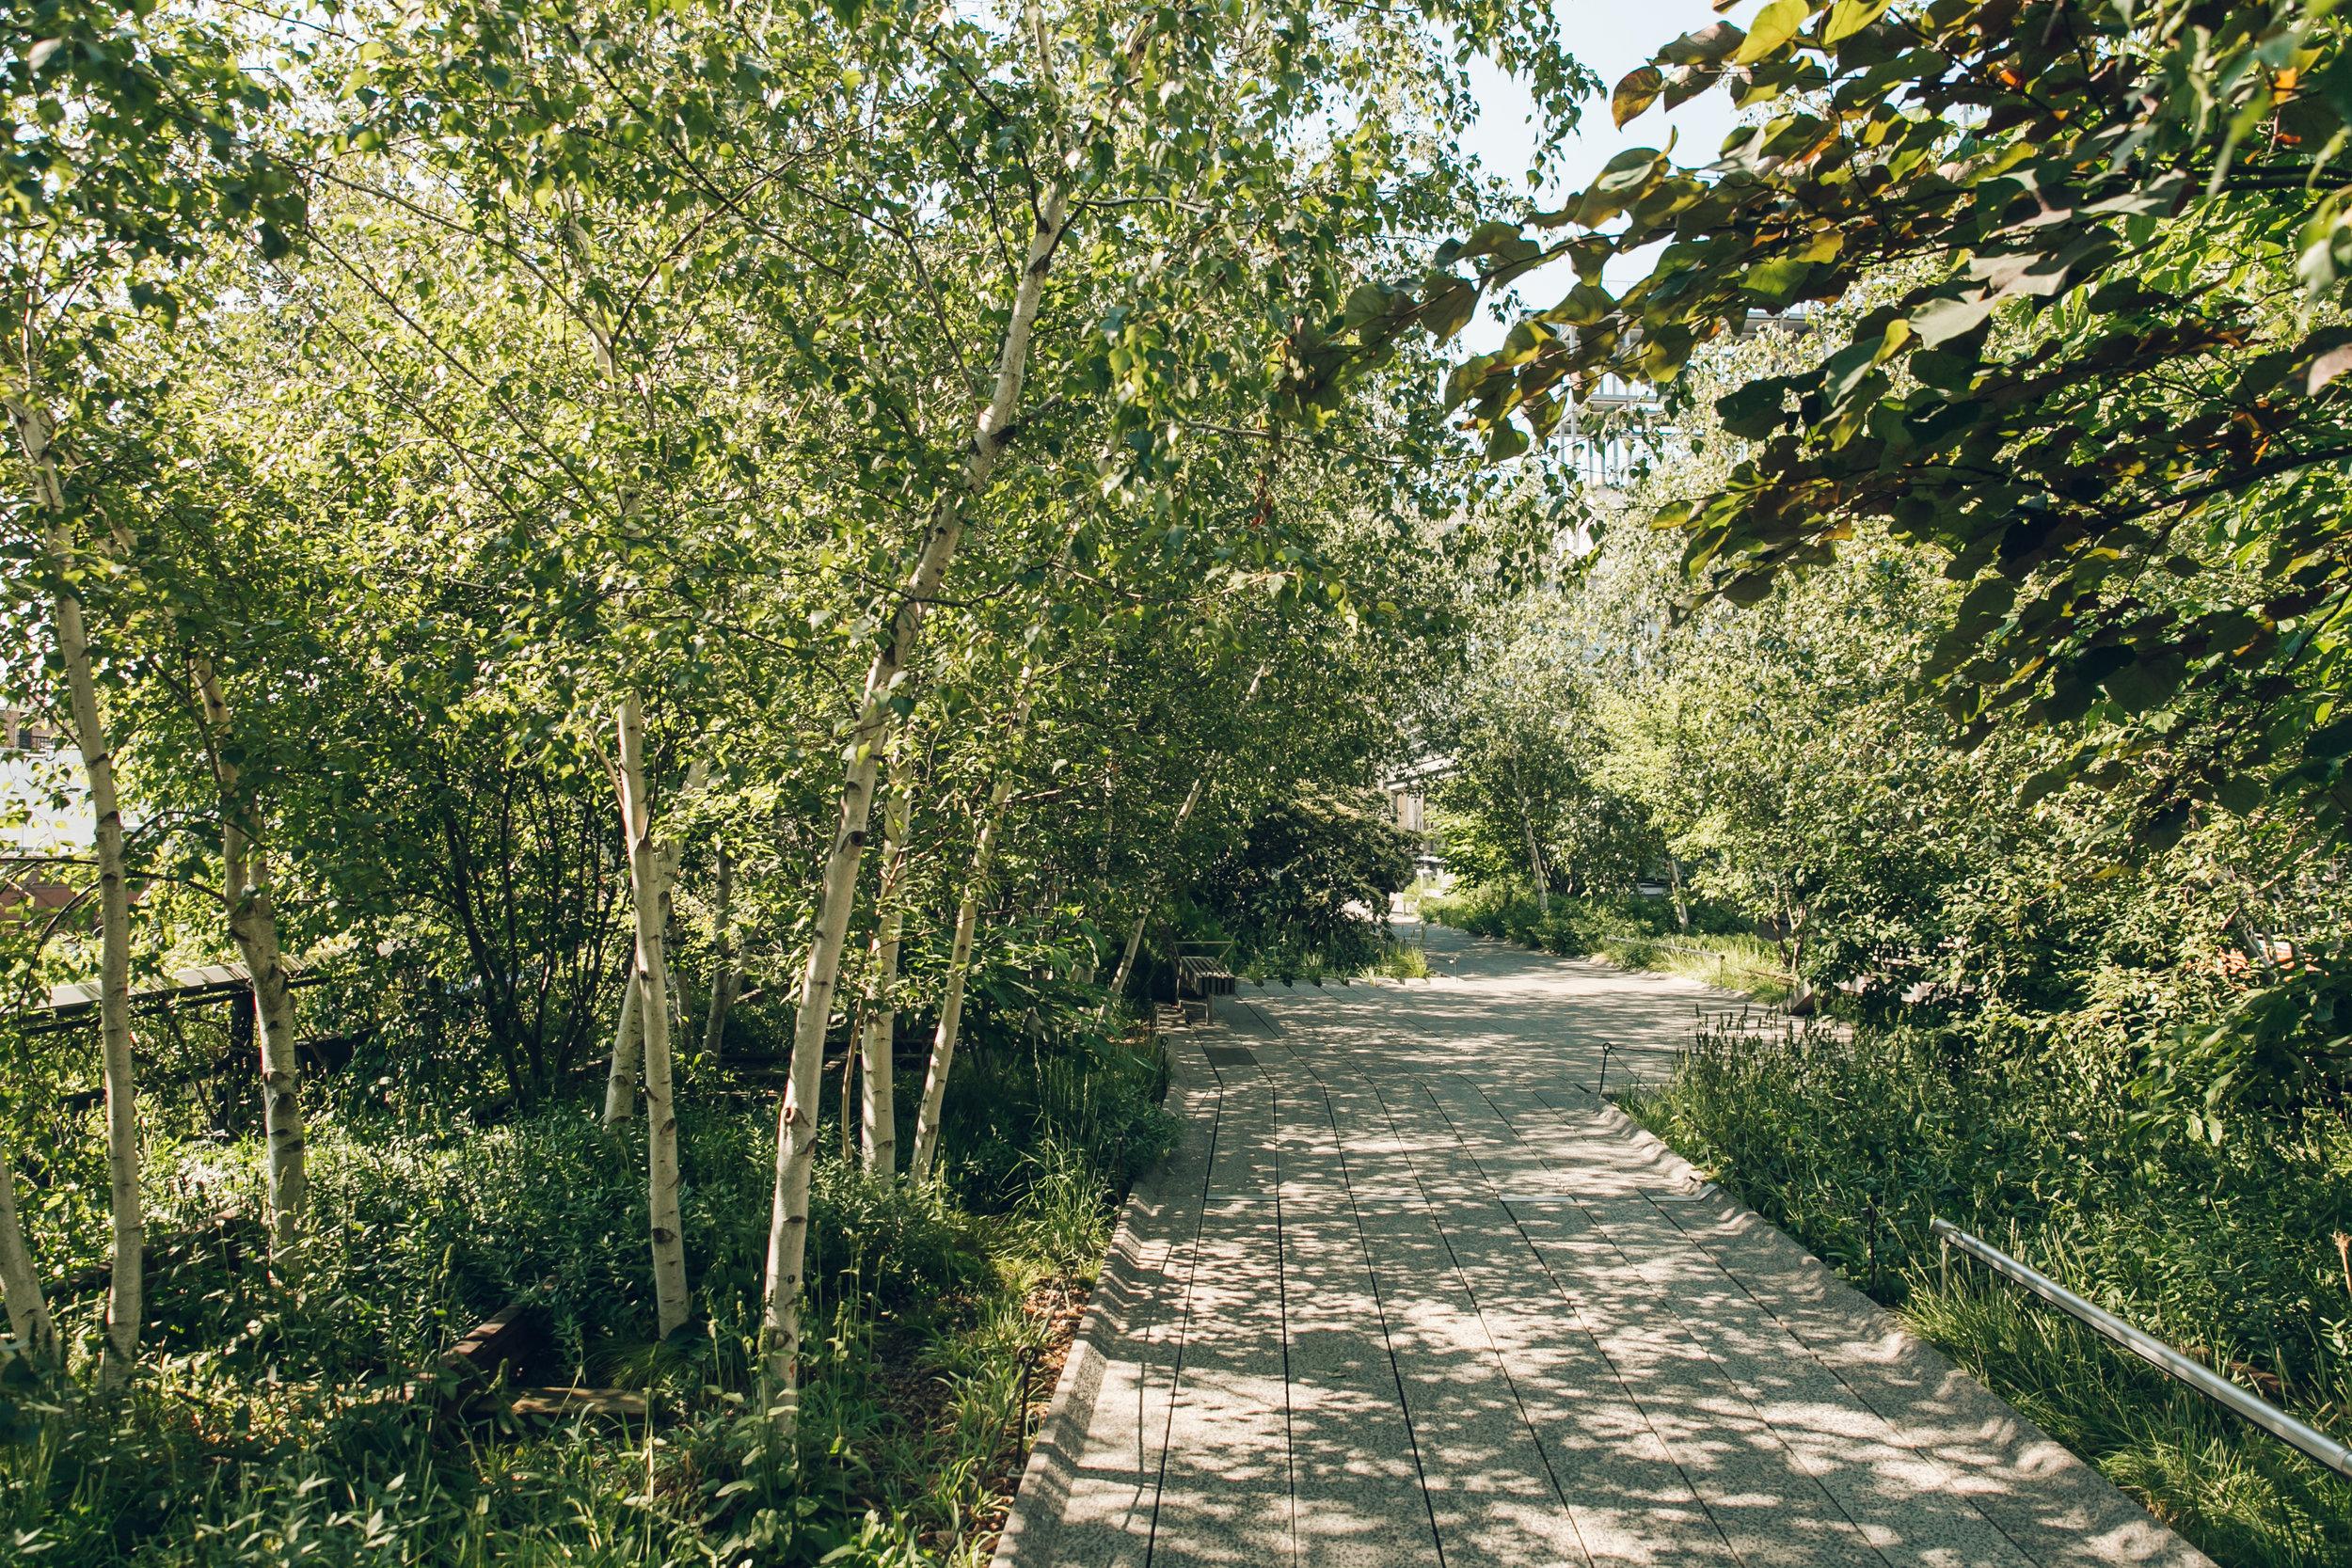 The High Line NYC Path